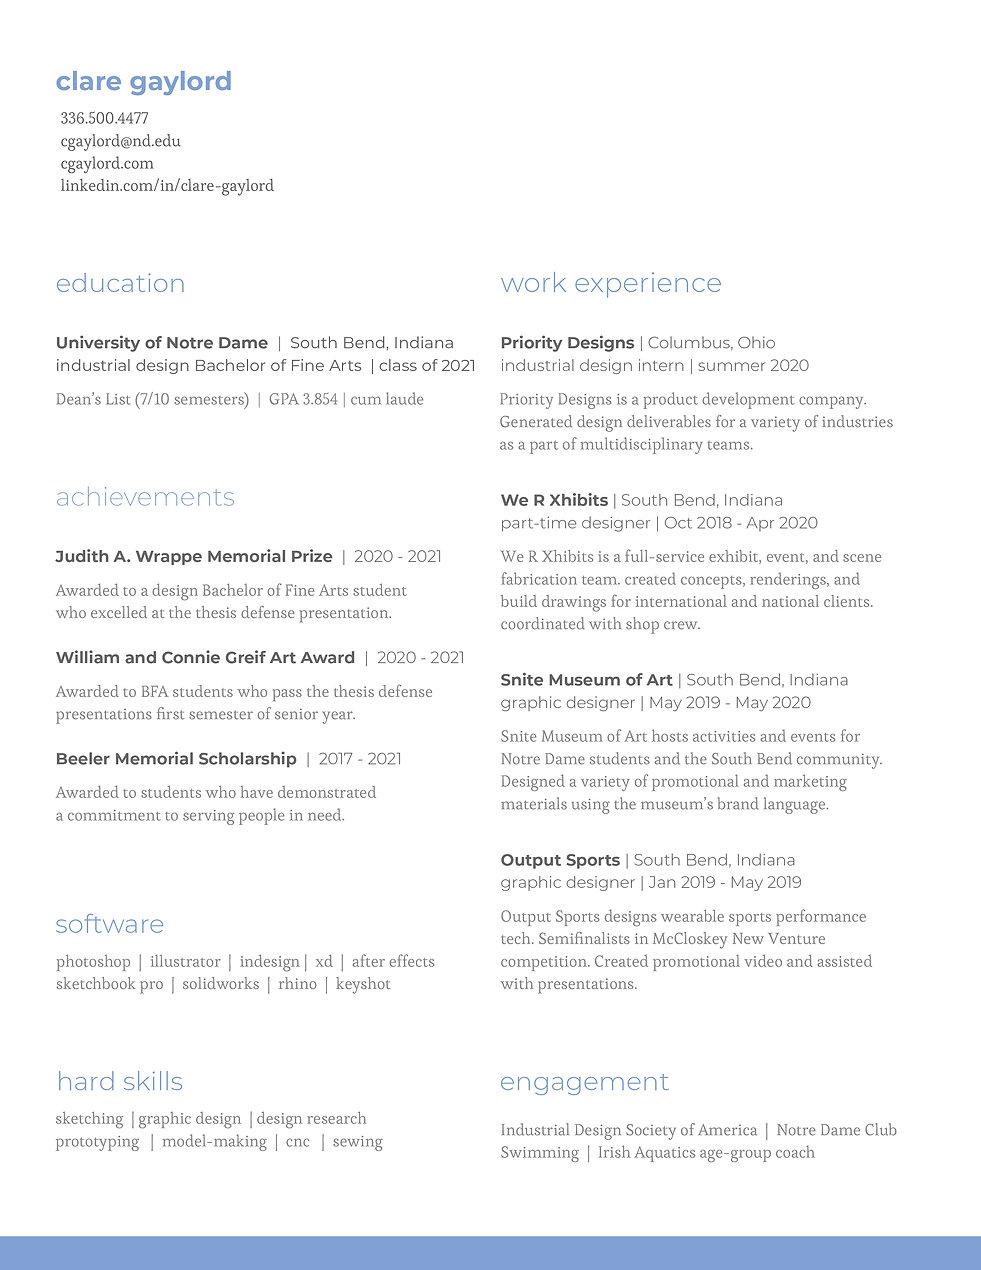 resume_v4_periwinkle.jpg